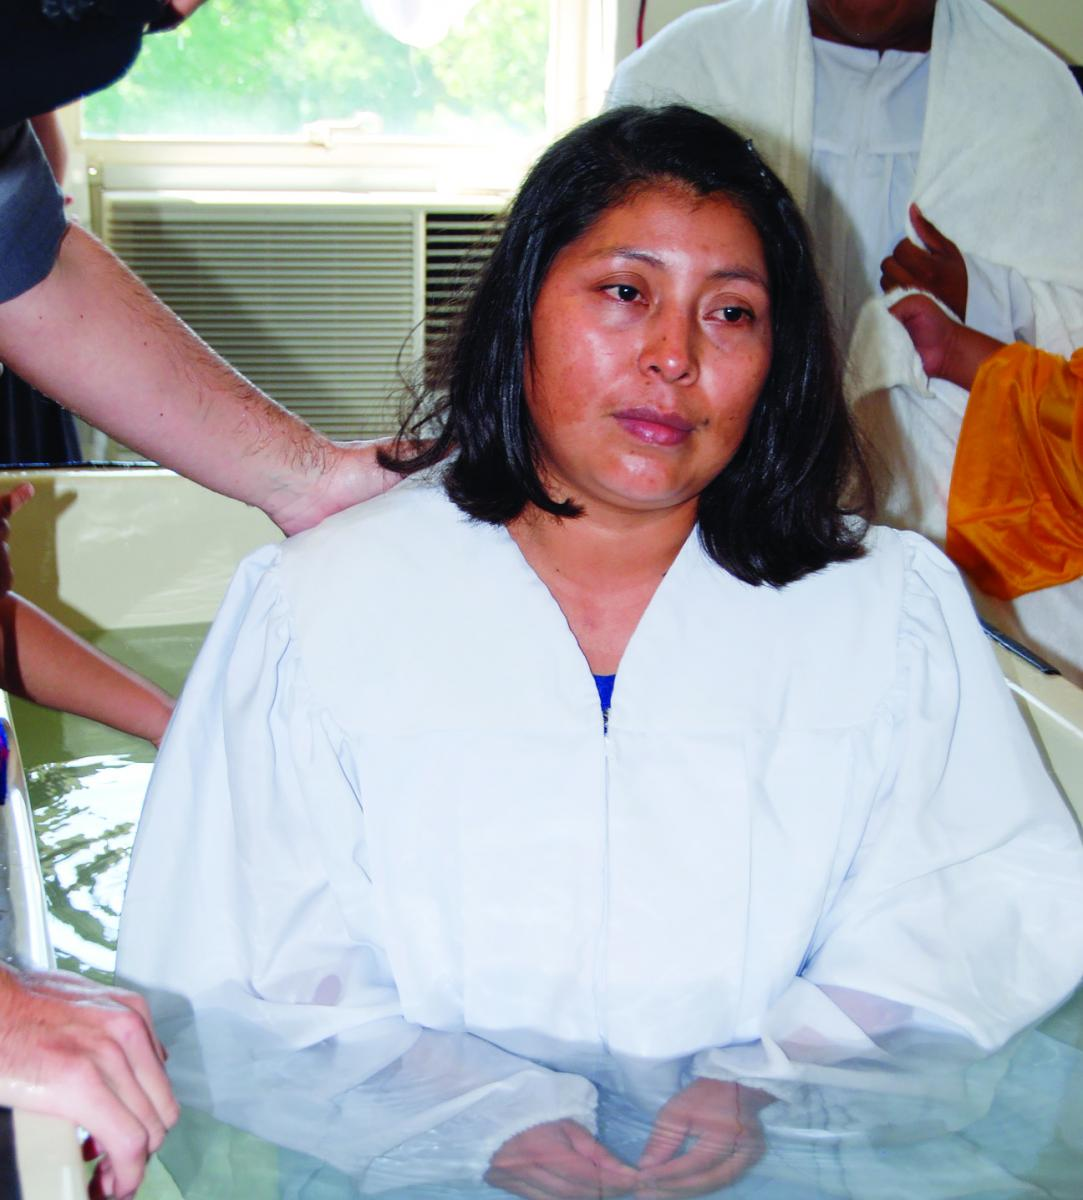 Lidia Perez prepares for baptism.